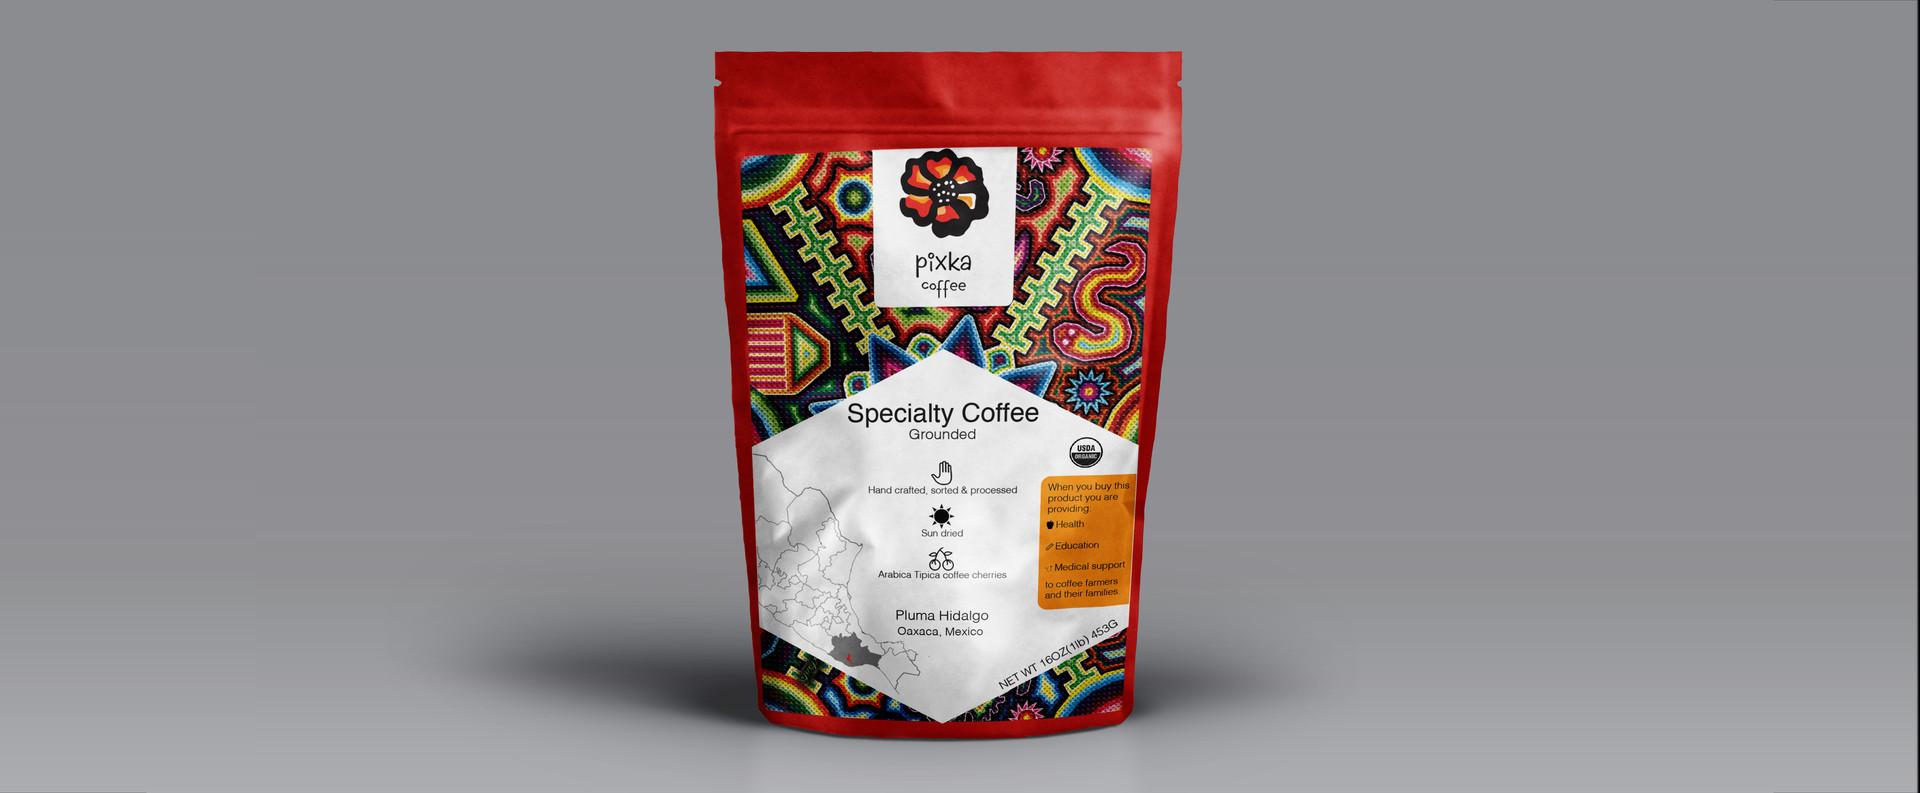 Pixka Coffee